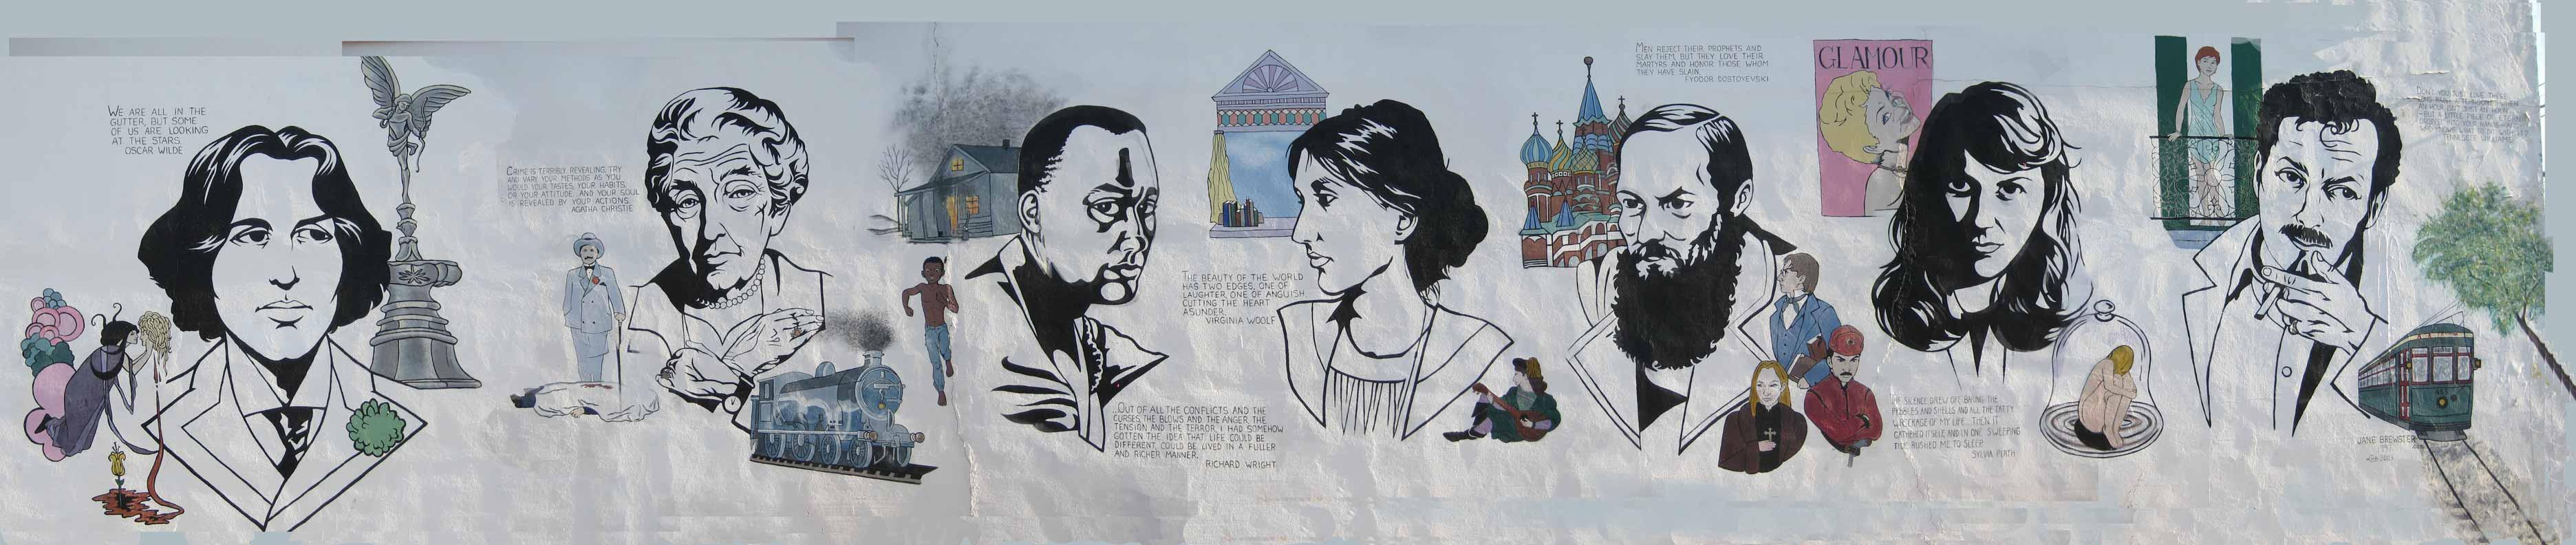 Street art - Literary Mural